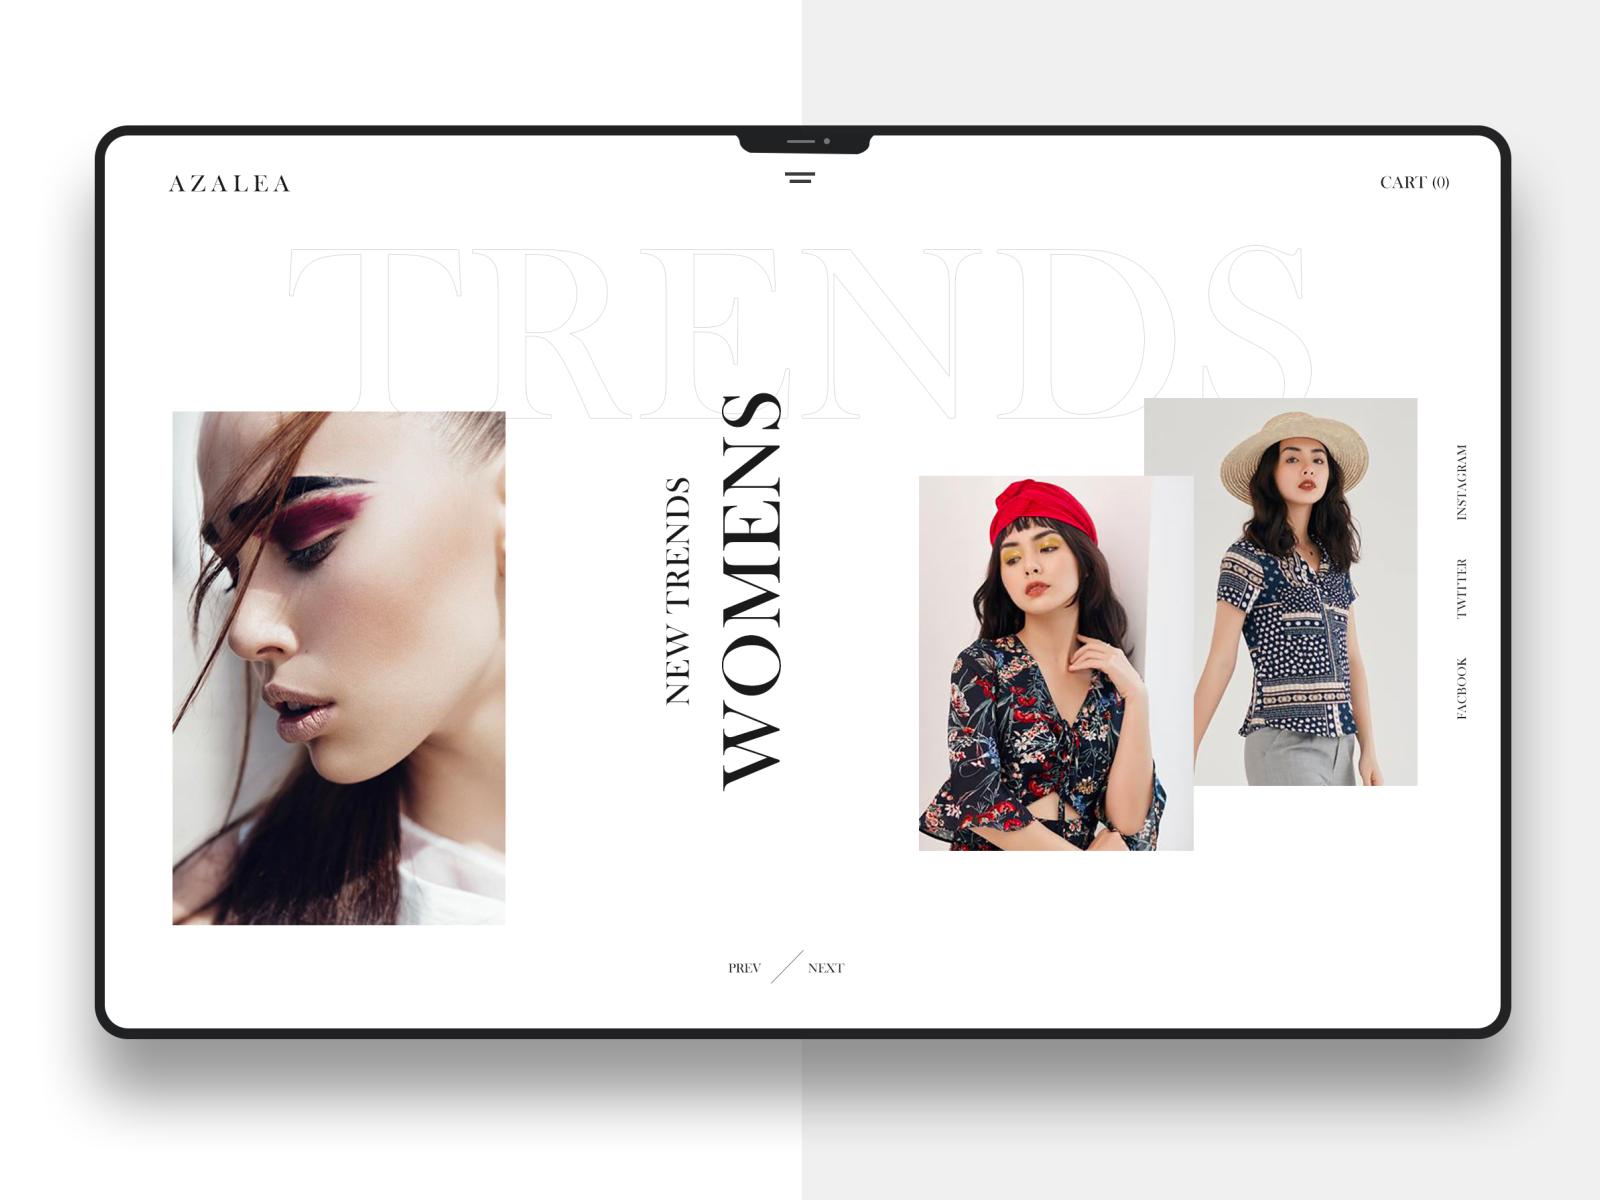 Fashion Web Banner Design By Ghulam Rasool On Dribbble